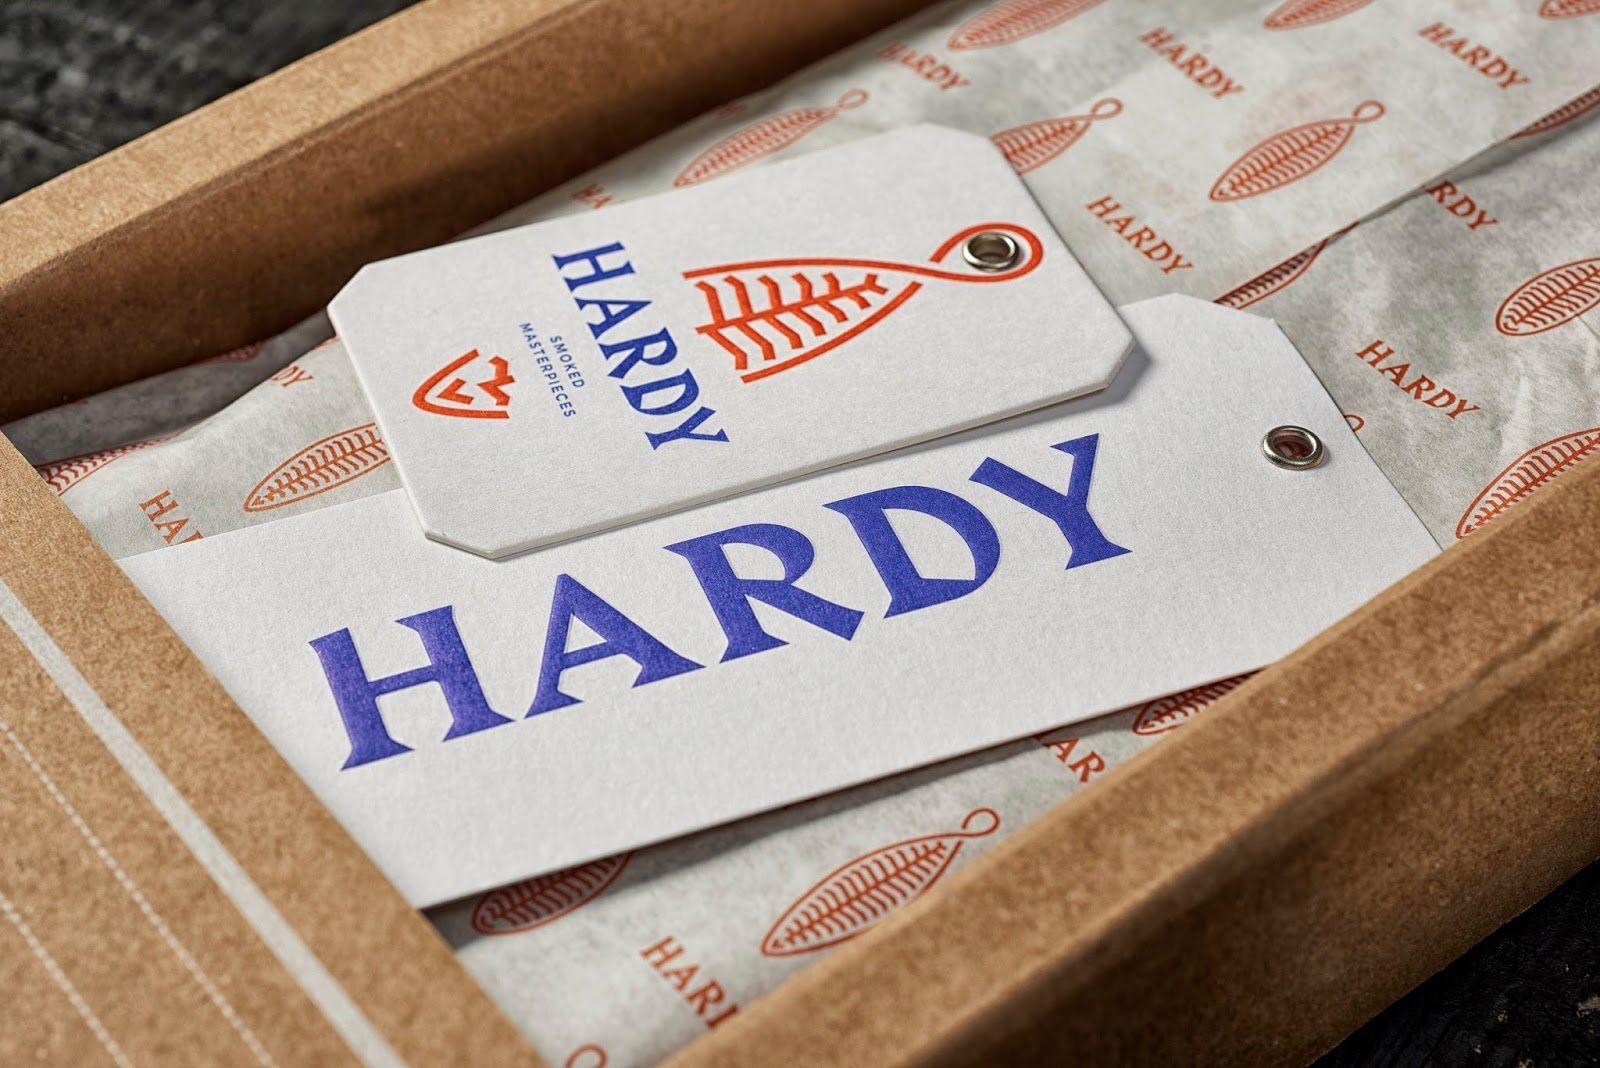 Hardy (poissons fumés premium) I Design : This is Pacifica, Porto, Portugal (mai 2018)